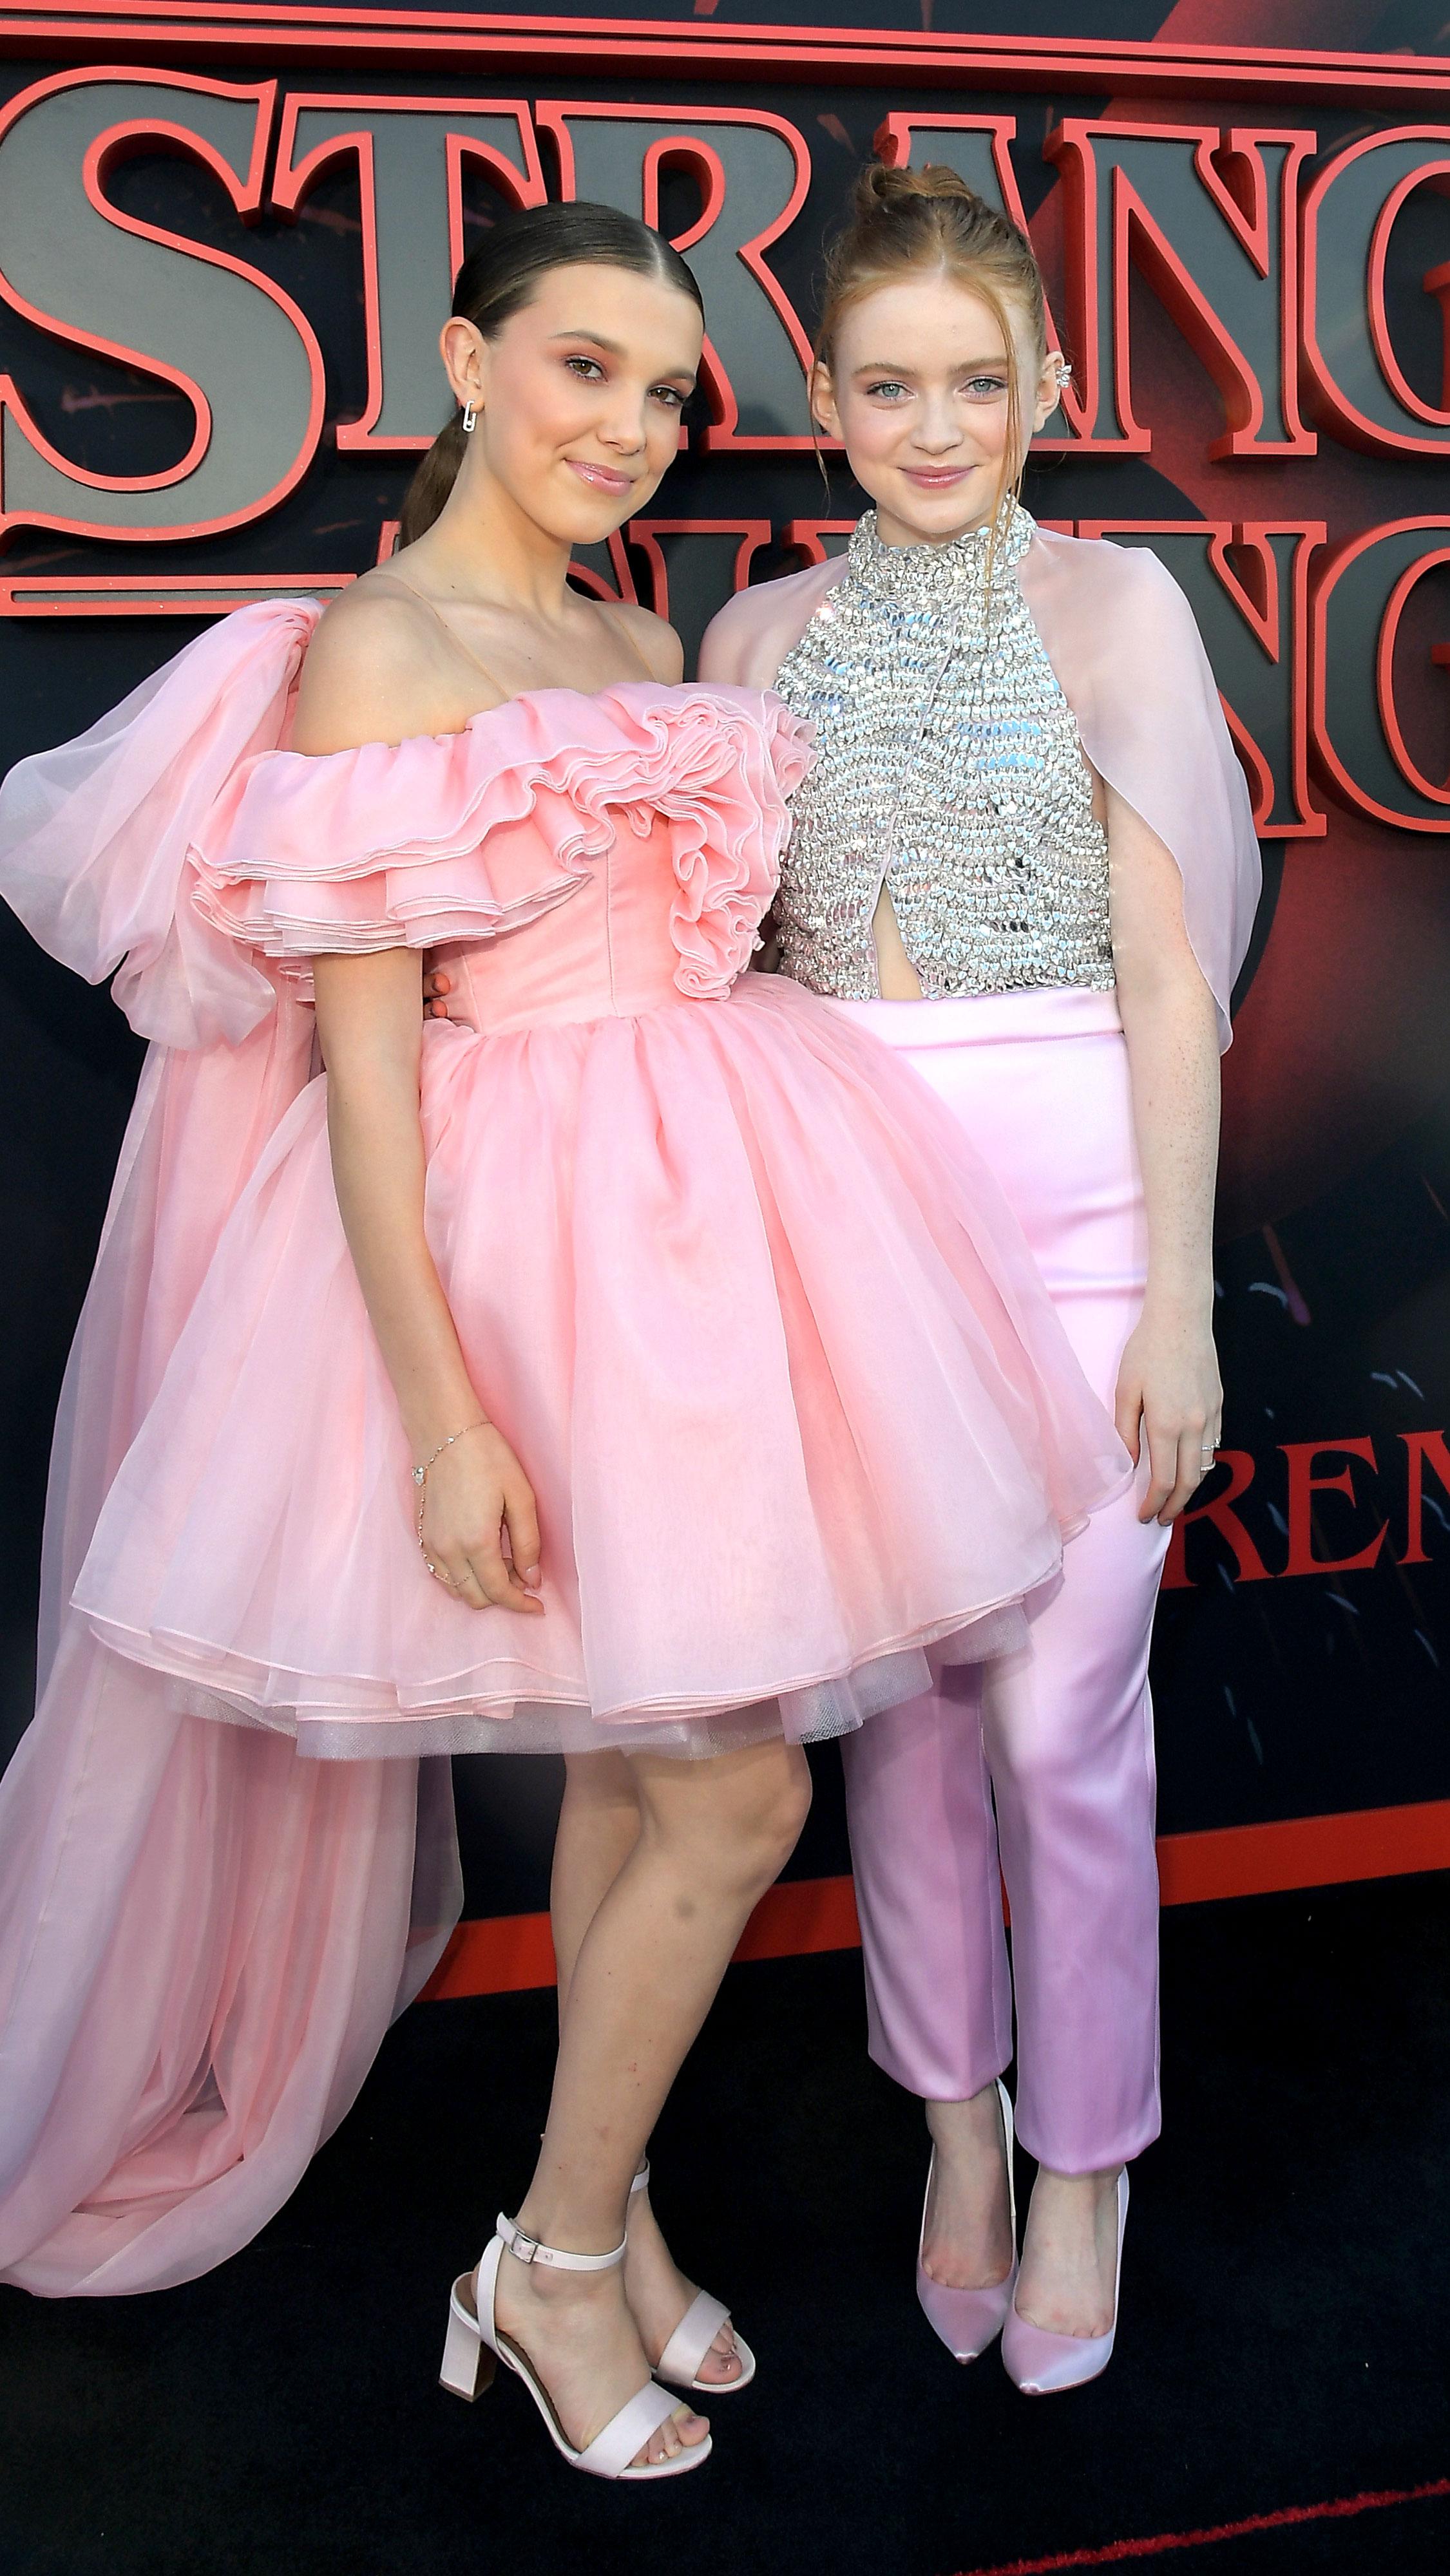 Stranger Things' Season 3 Red Carpet Premiere: Pics